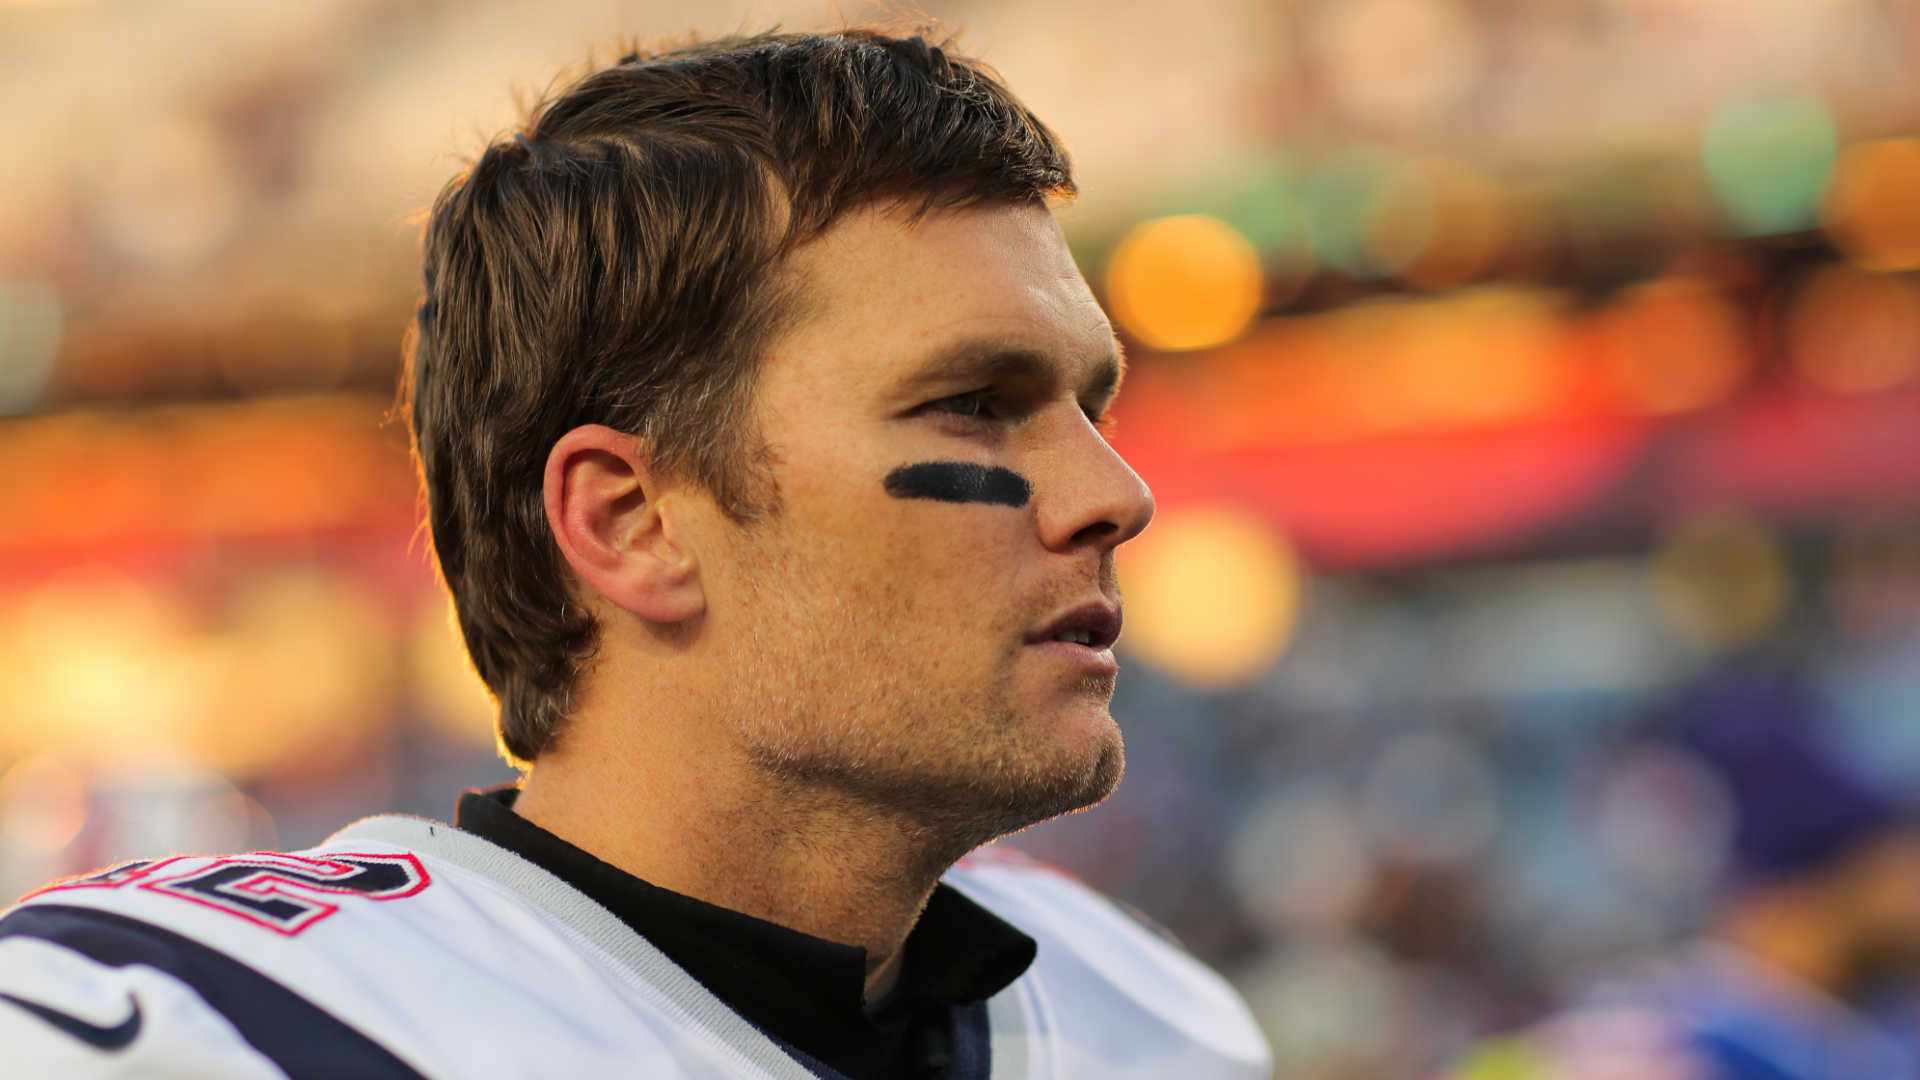 Thumbgate: Tom Brady arrives to Gillette Stadium, keeps right hand hidden